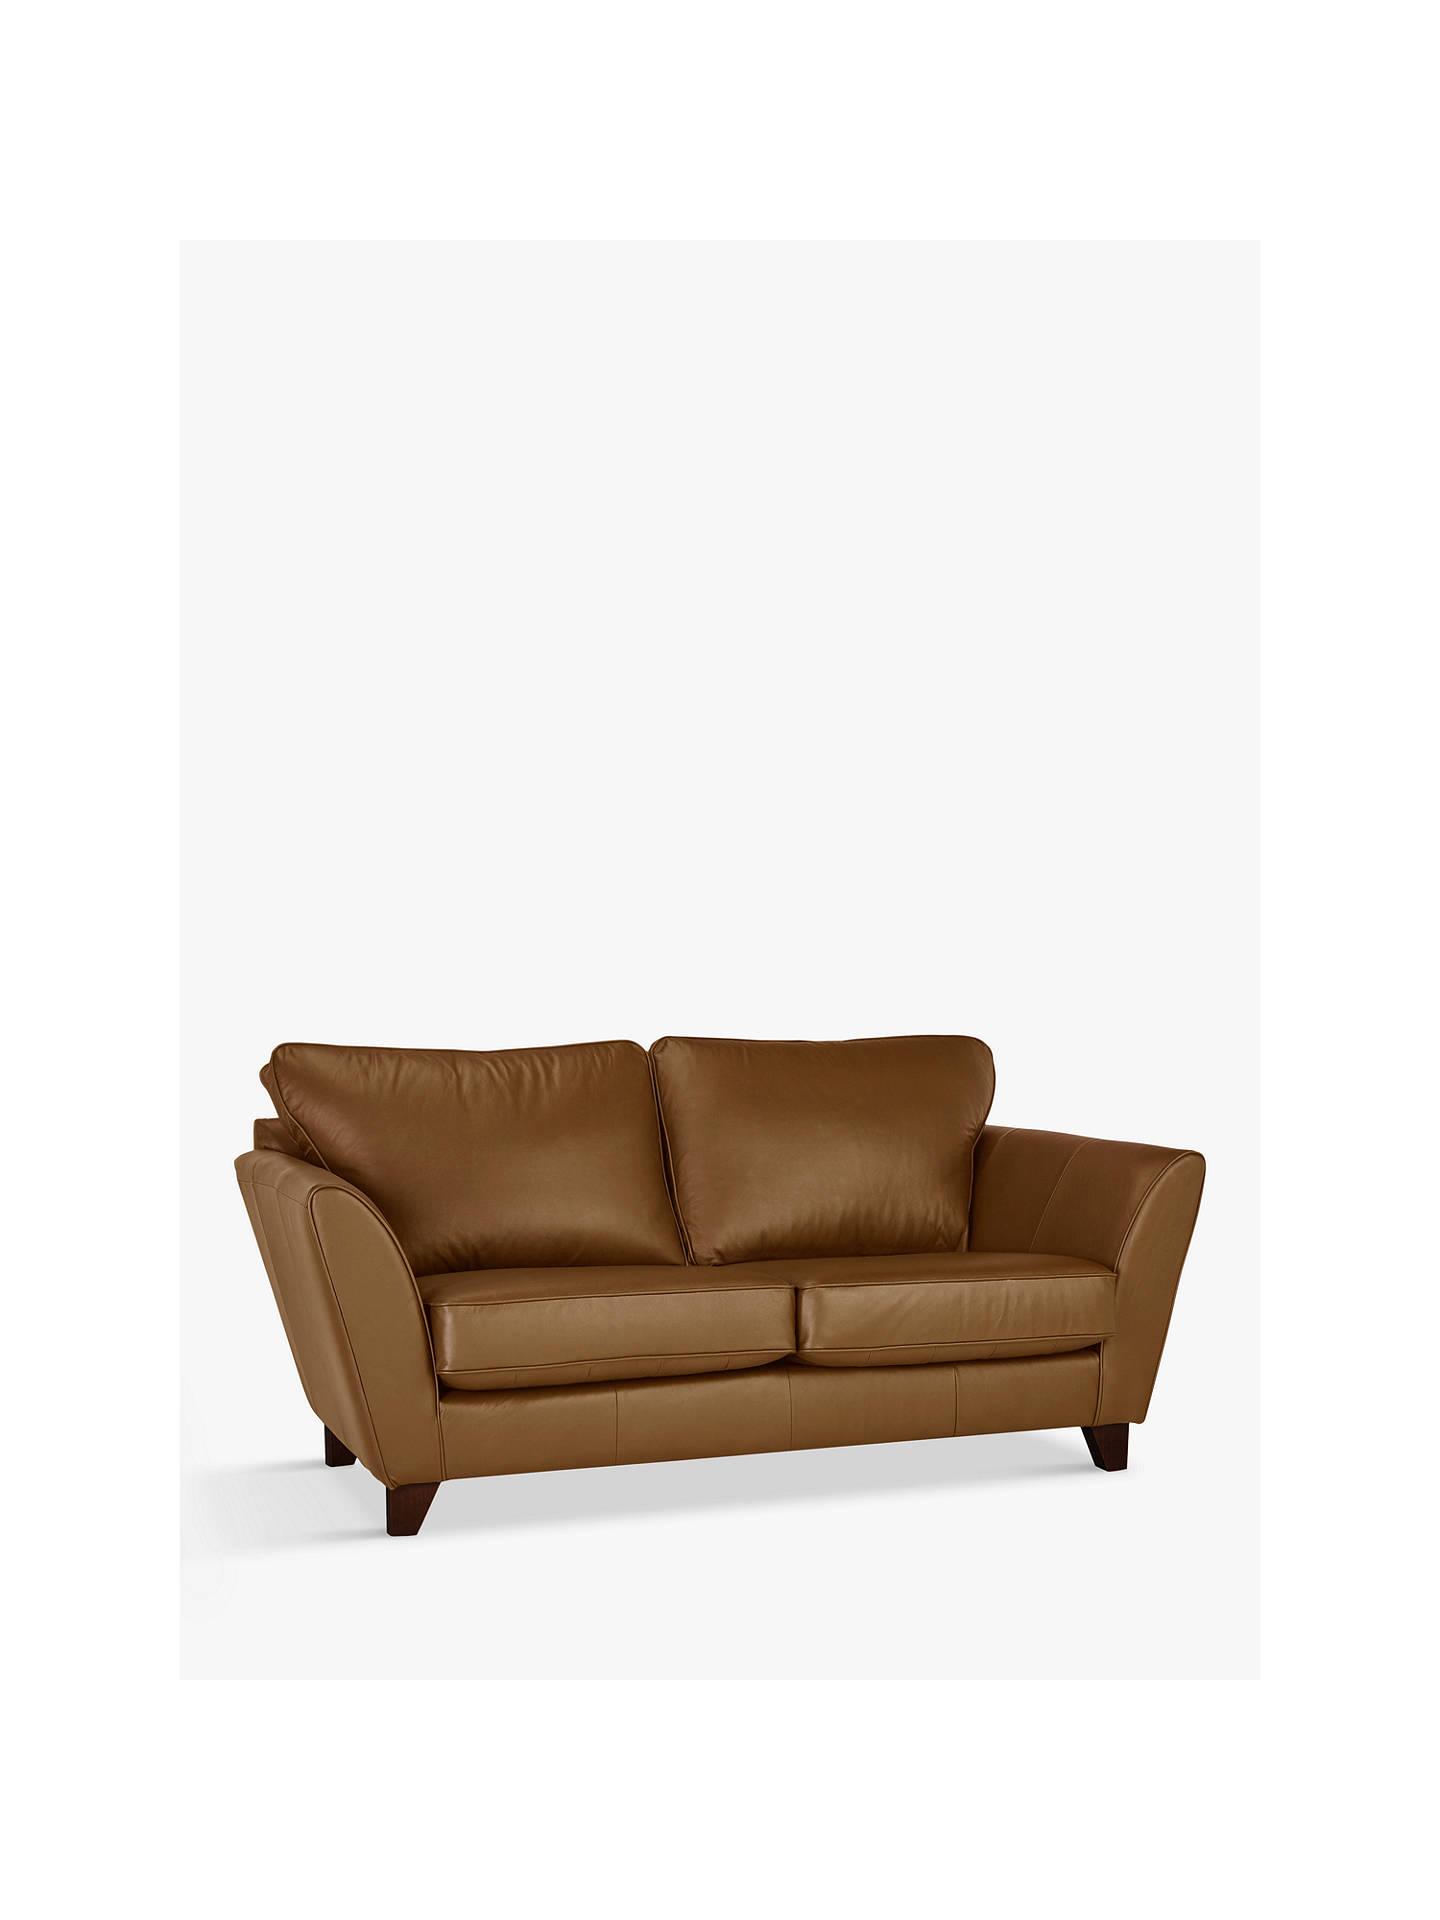 John Lewis Partners Oslo Small 2 Seater Leather Sofa Dark Leg Er Cucino